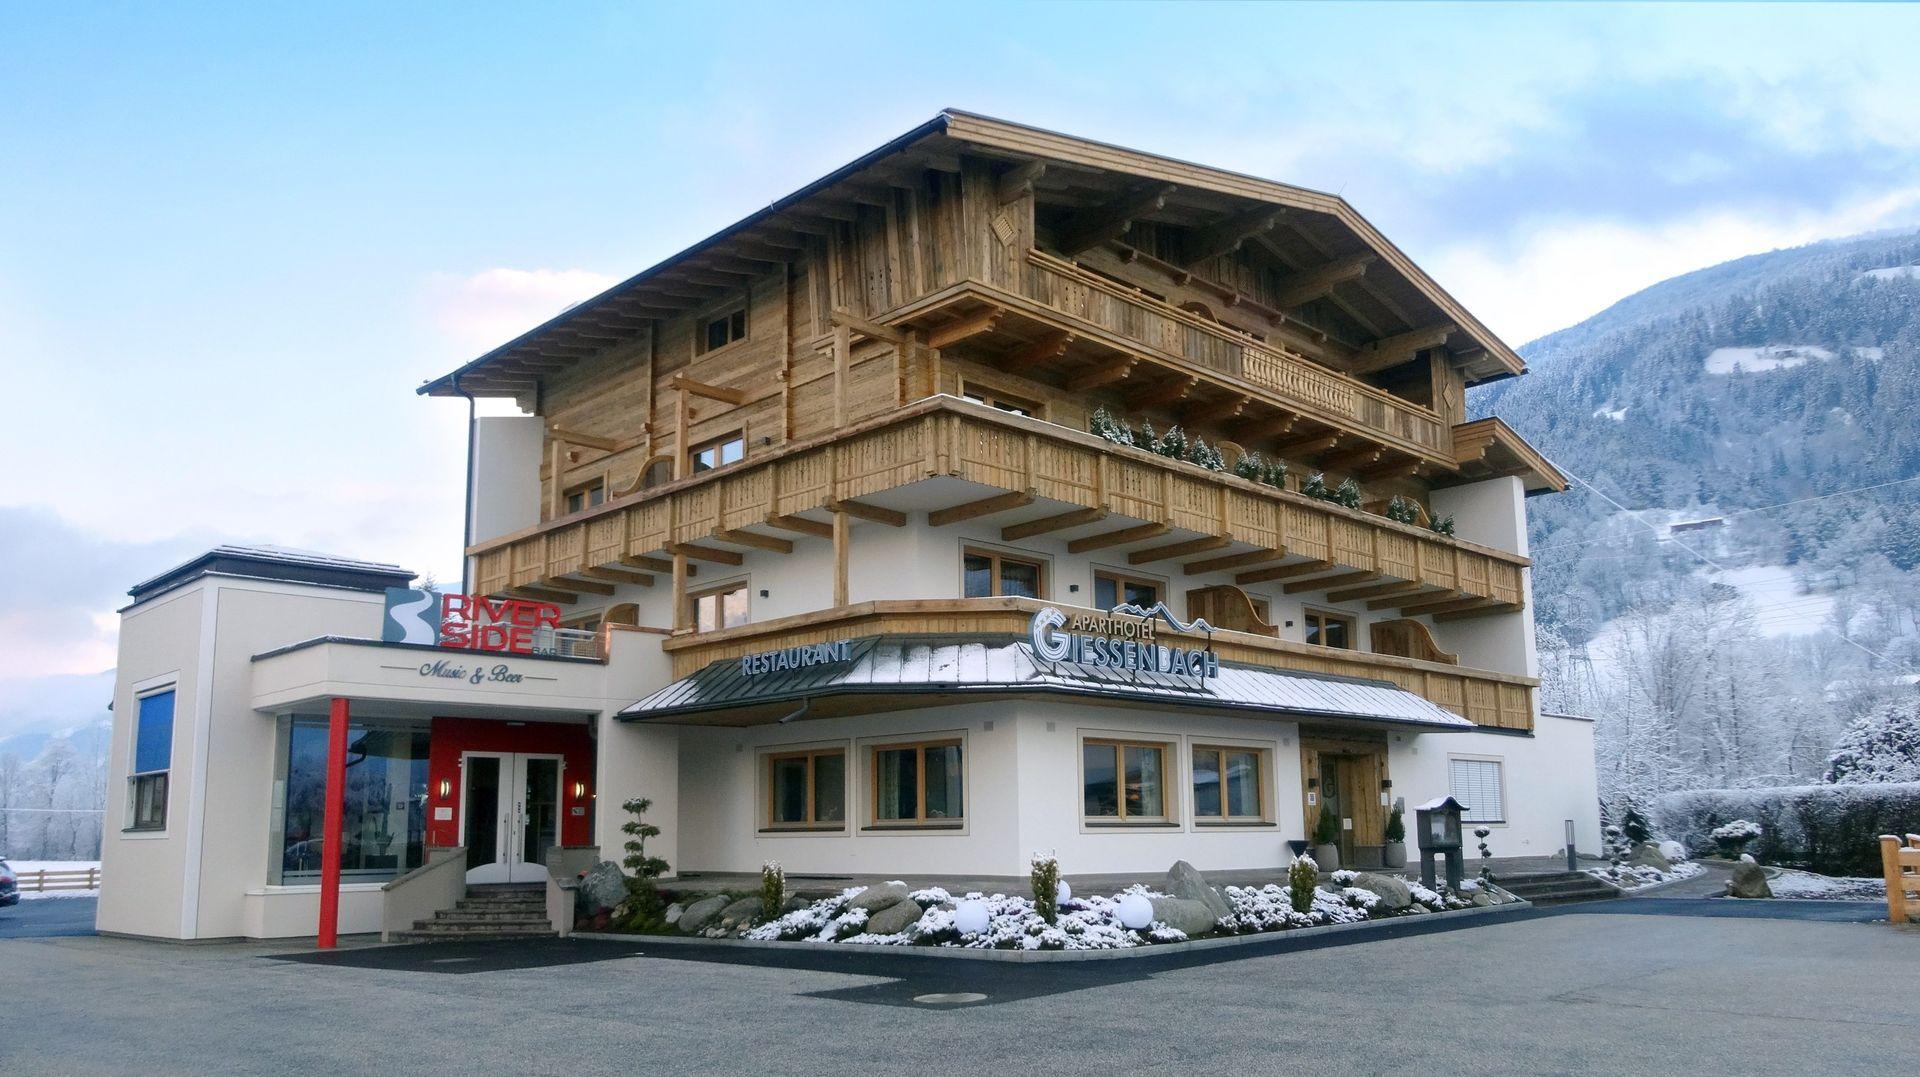 Slide1 - Hotel Restaurant Giessenbach